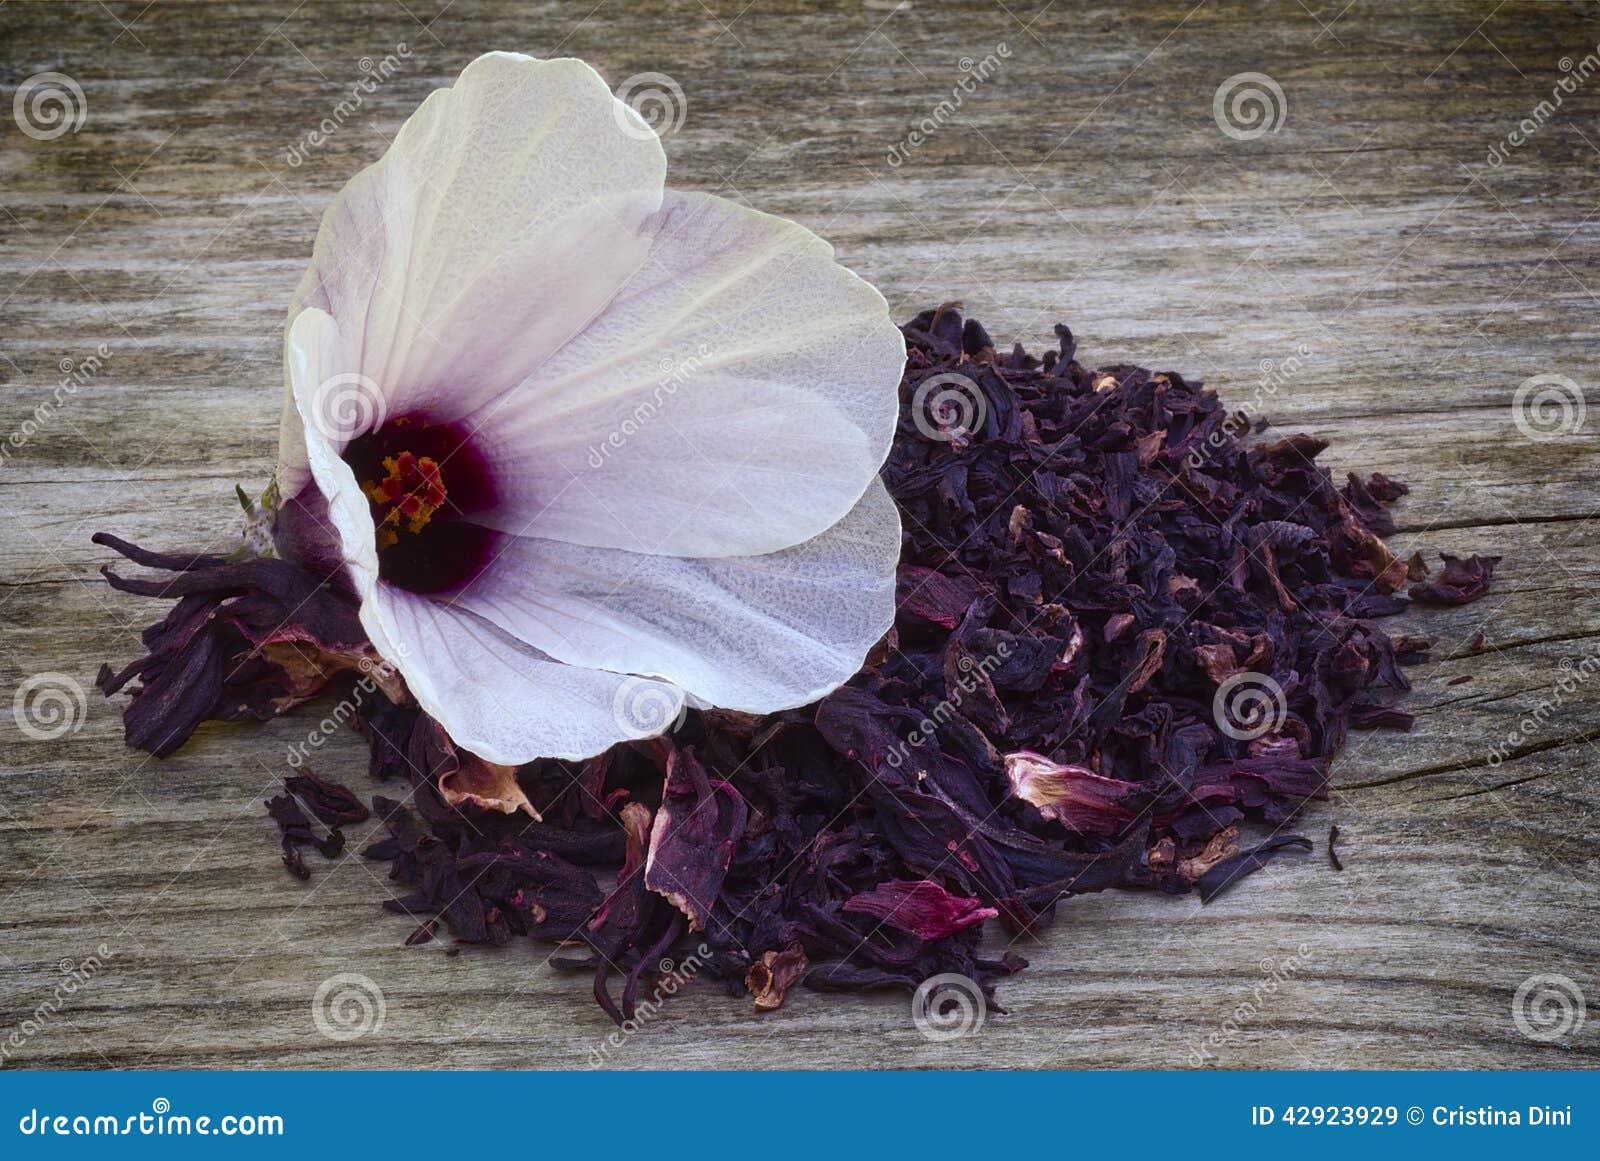 Hibiscus tea hibiscus sabdariffa flower and sepals dried for i royalty free stock photo izmirmasajfo